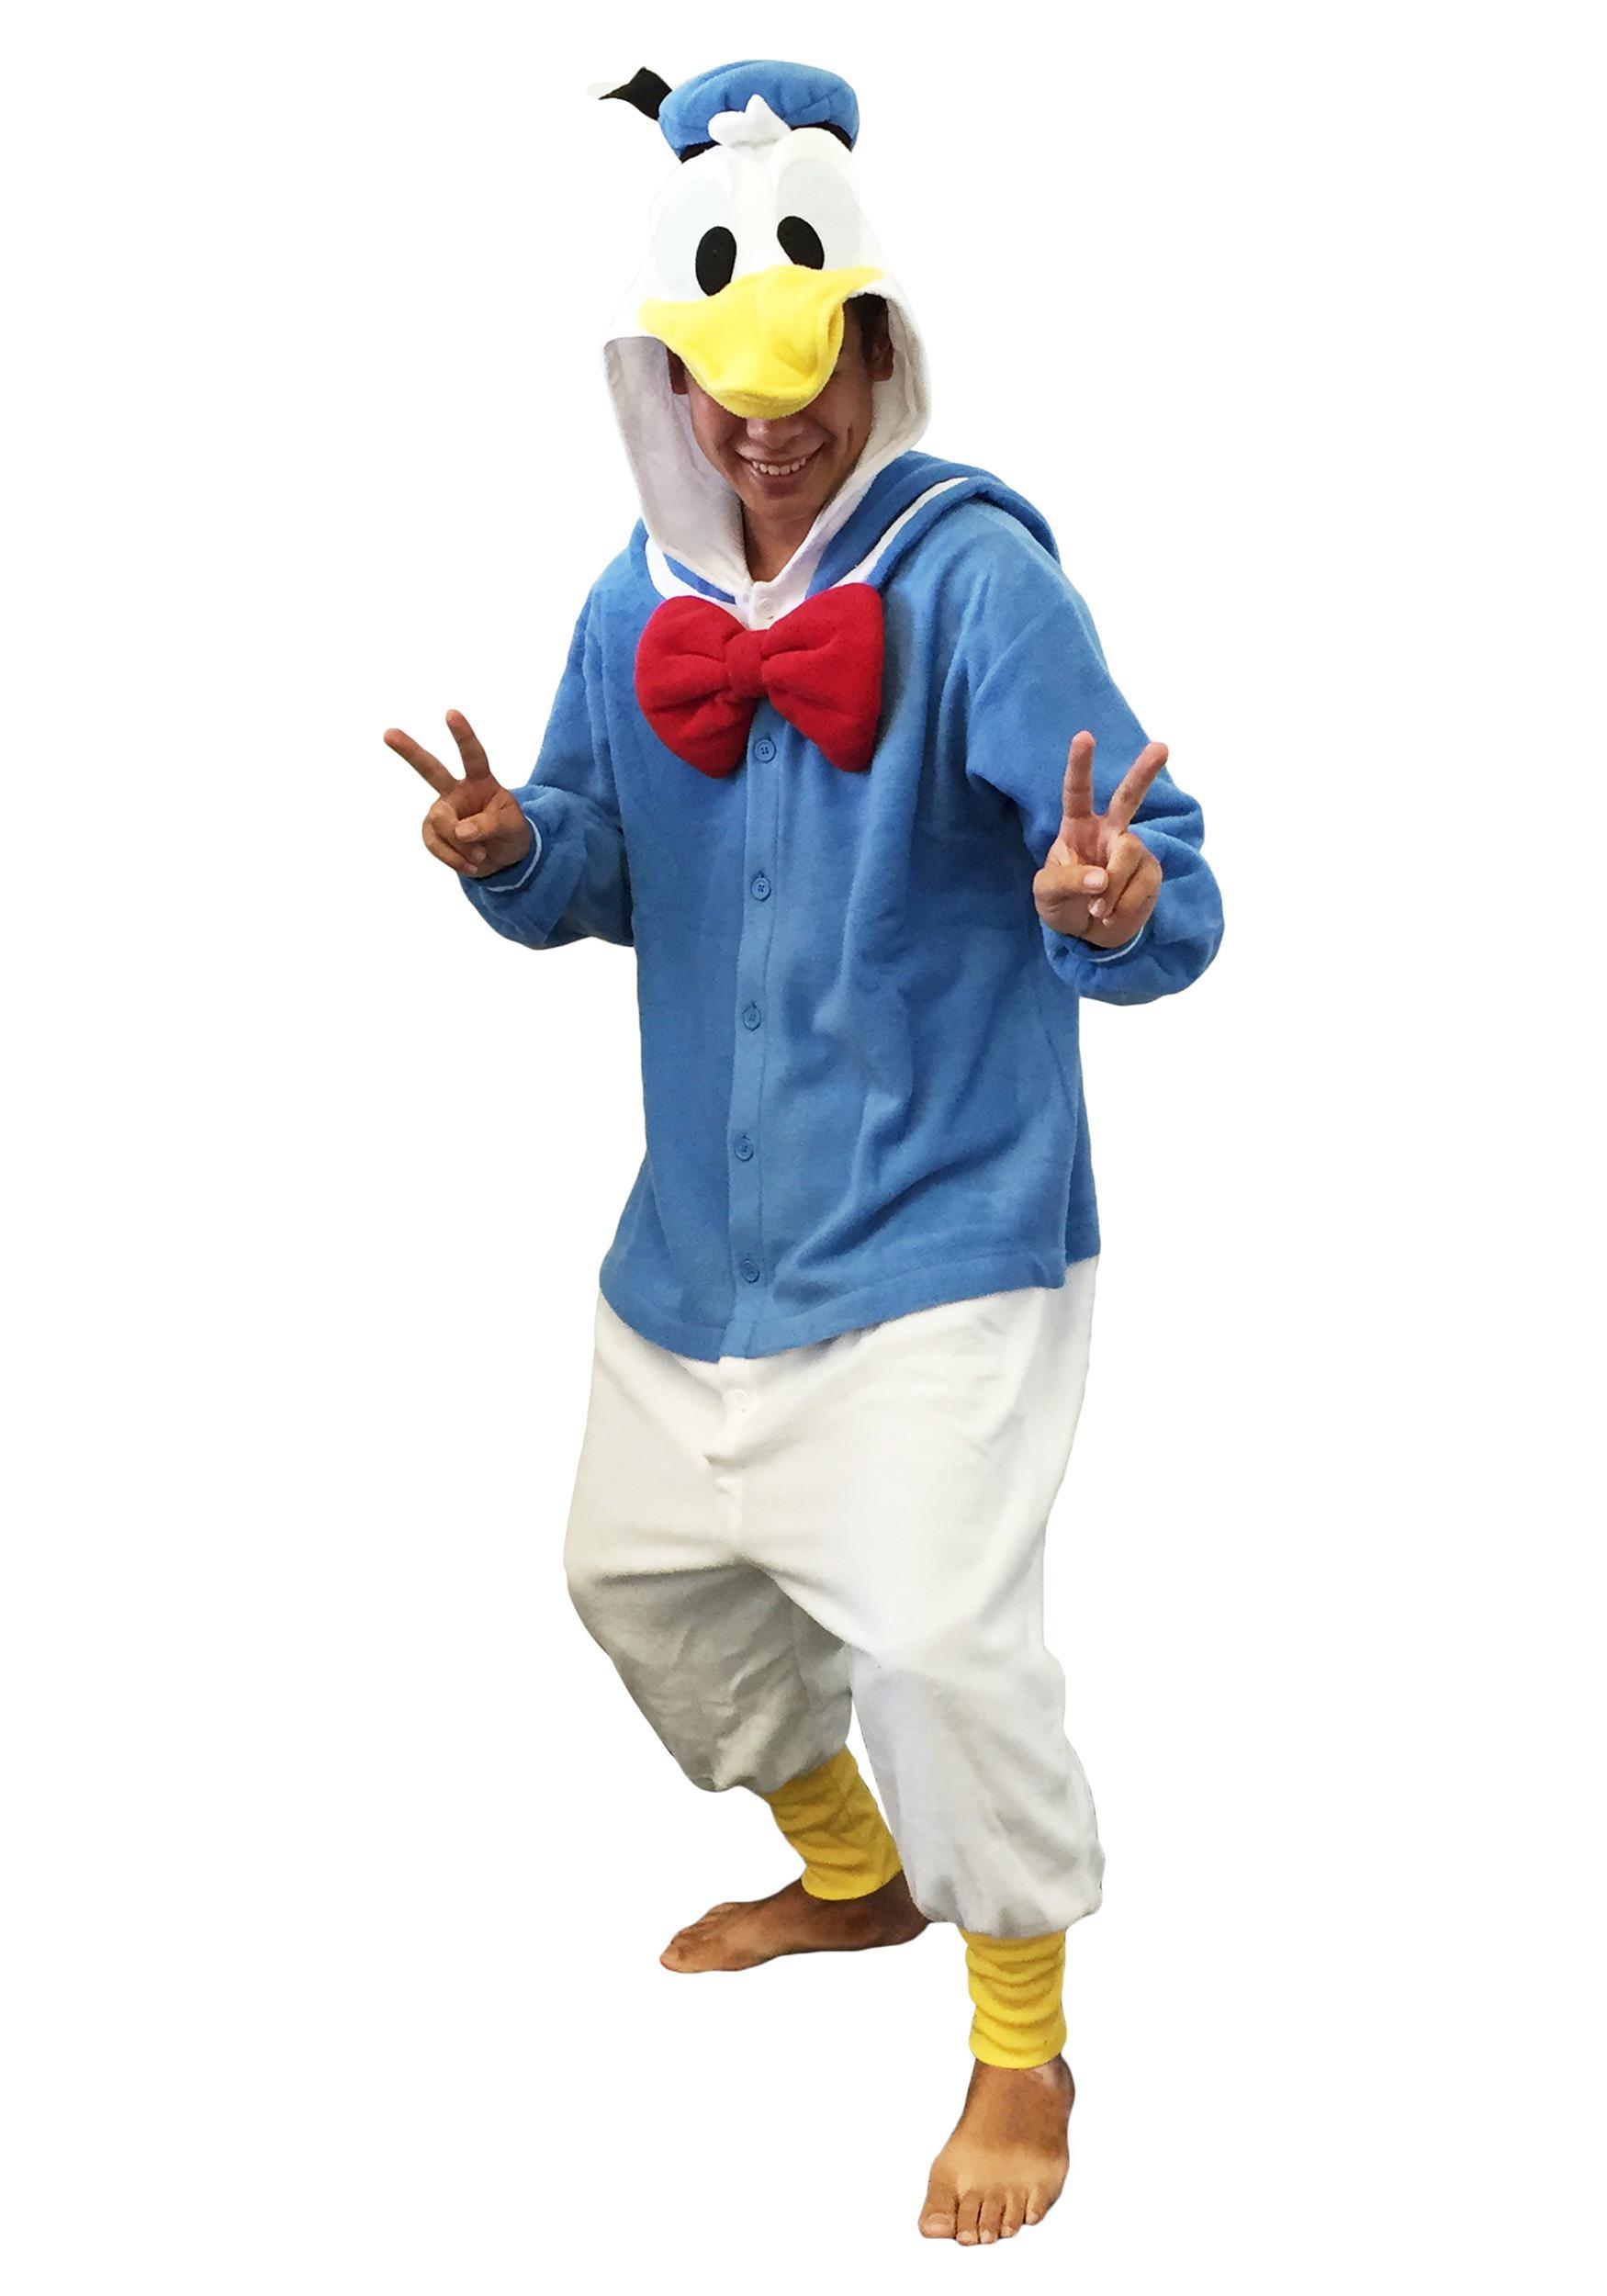 ... Disney Donald Duck Pajama Costume ...  sc 1 st  Halloween Costume & Disney Donald Duck Pajama Costume - PJ Character Costumes